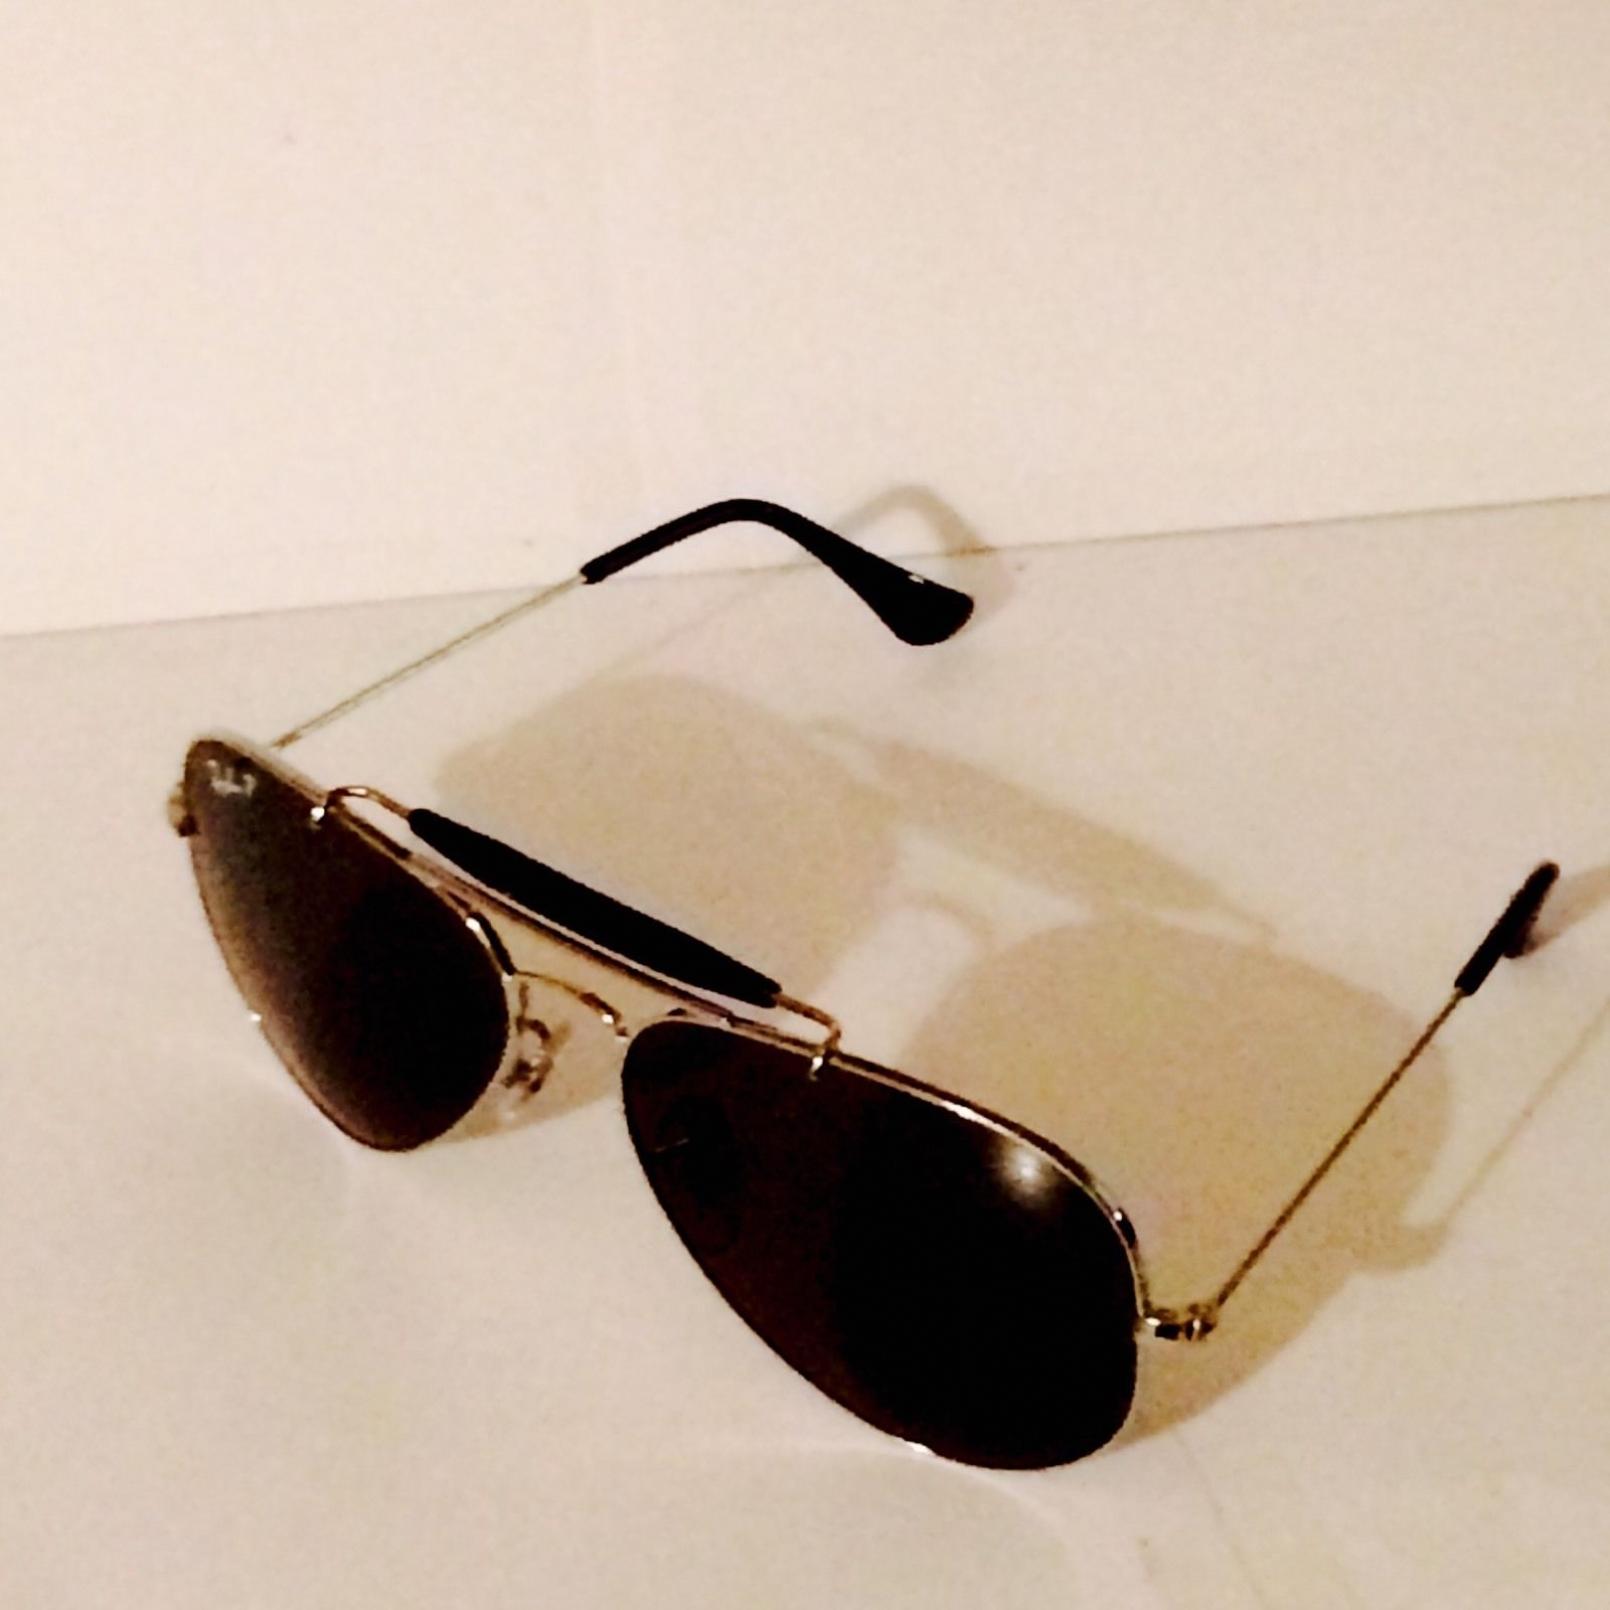 chinese ray ban sunglasses